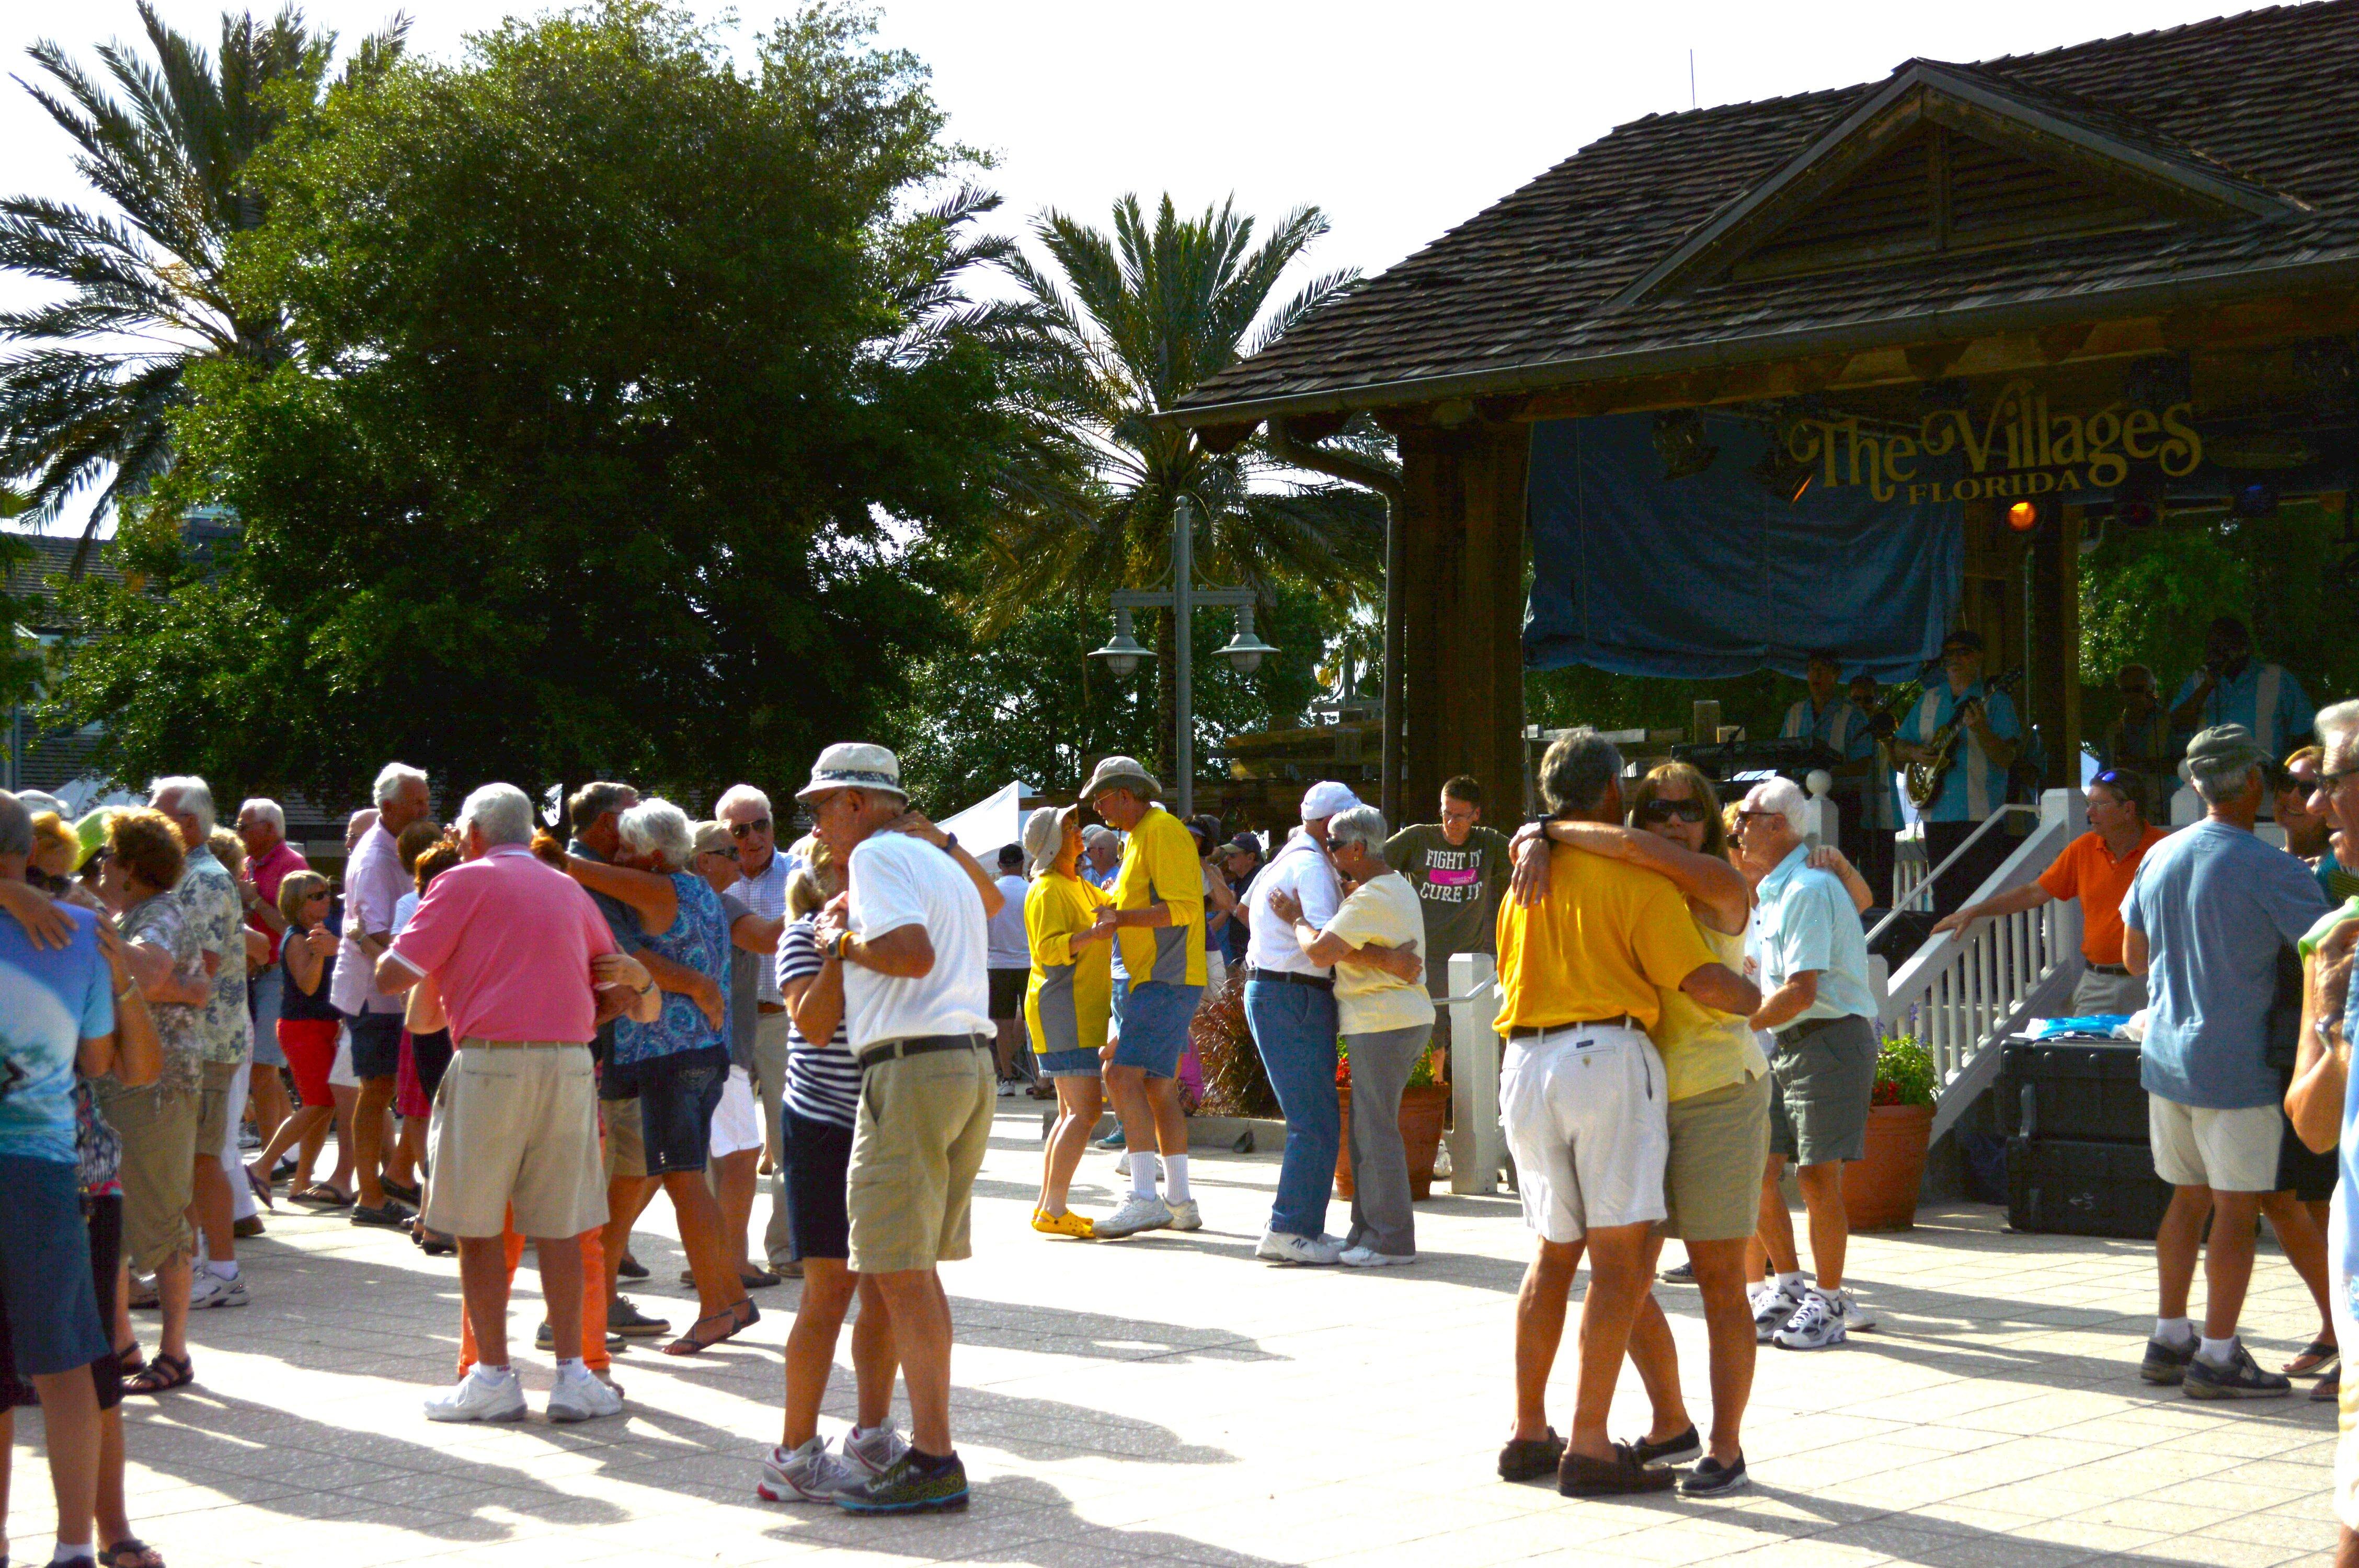 Image result for The villages, Florida, U.S.A